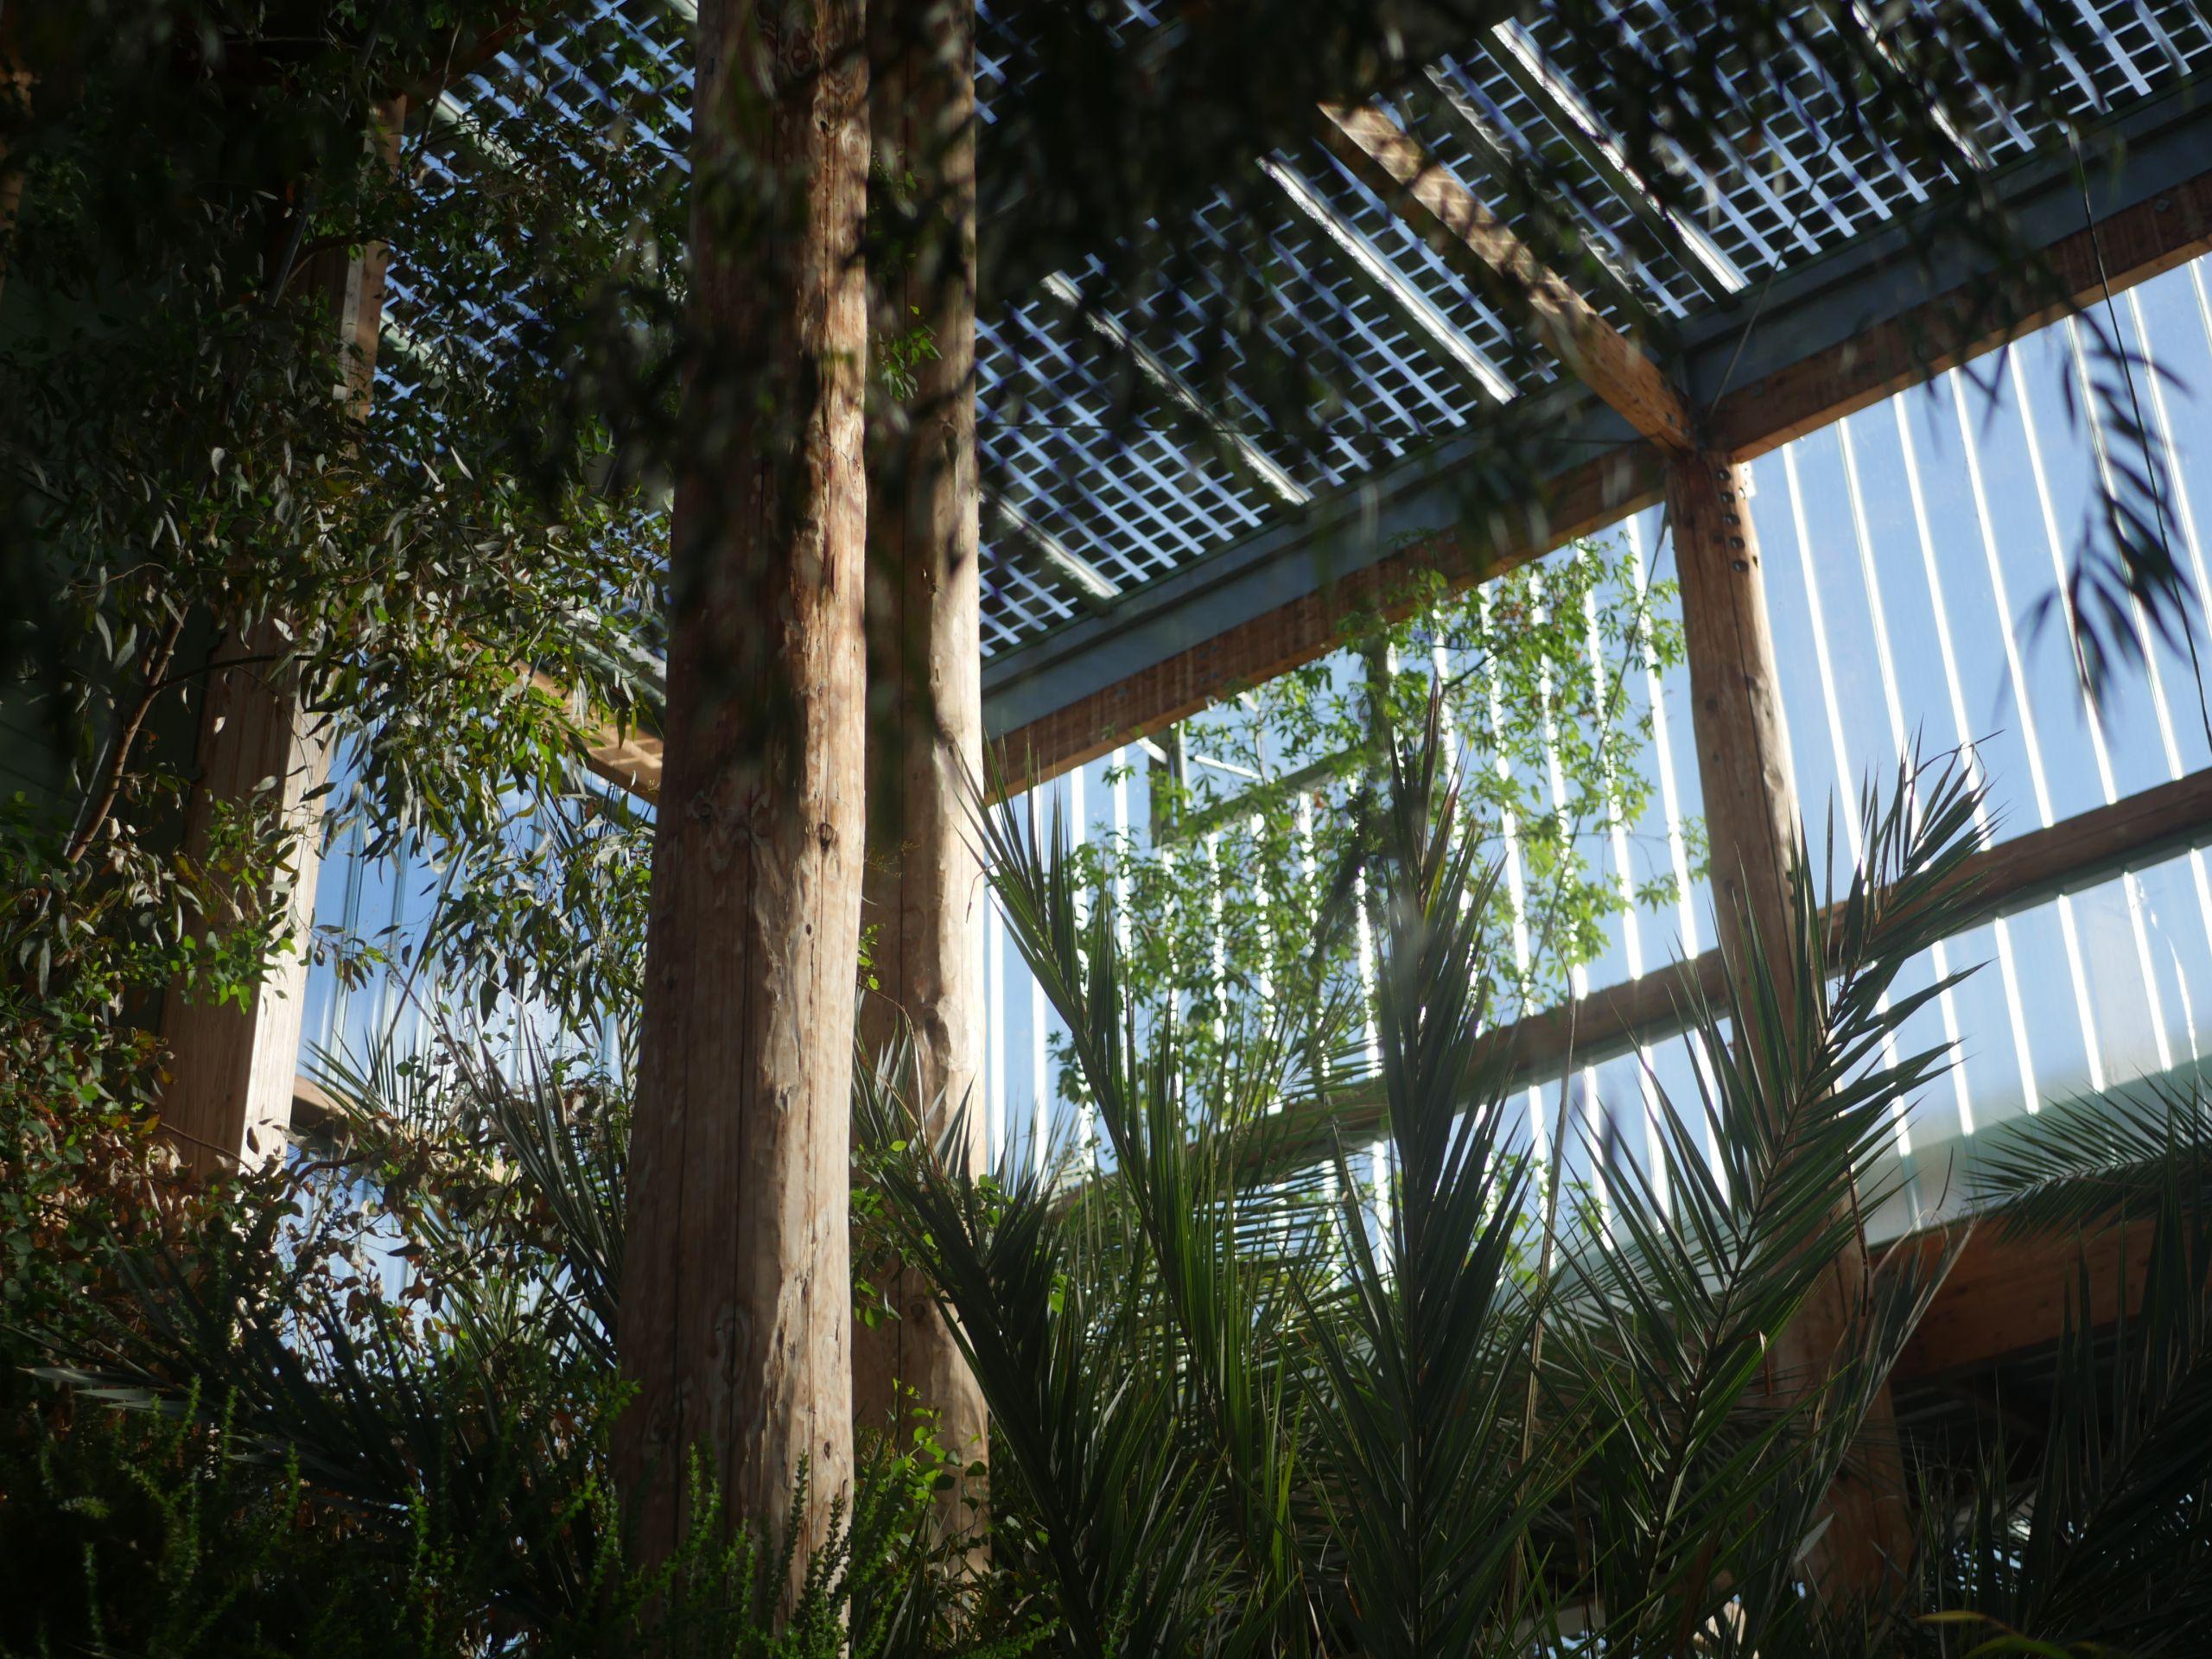 Jardin botanique Serres Bordeaux batiment photo Sara Soulignac